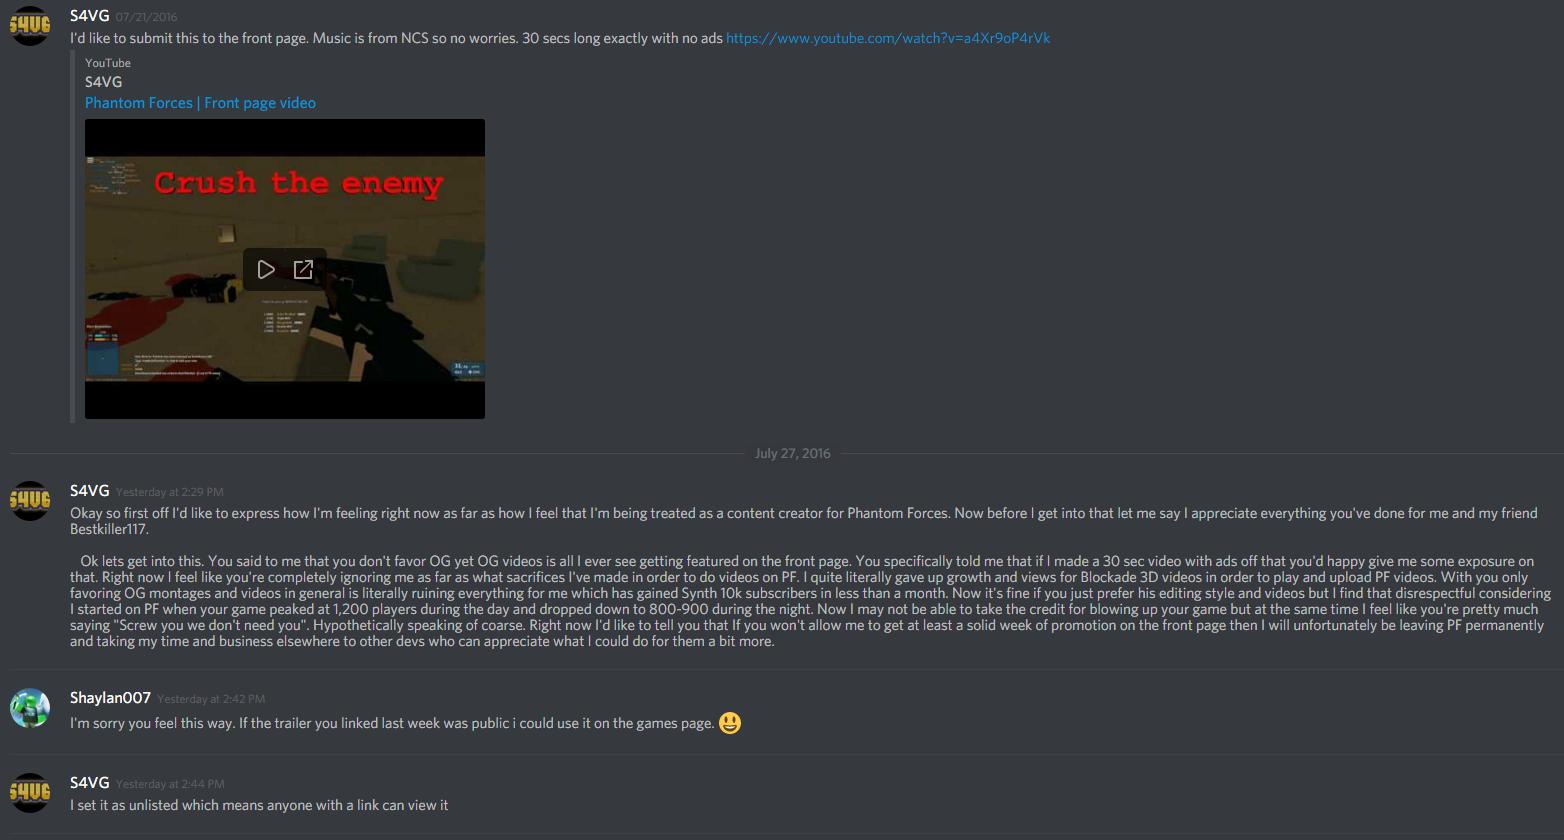 Stop talking about S4VG : PhantomForces